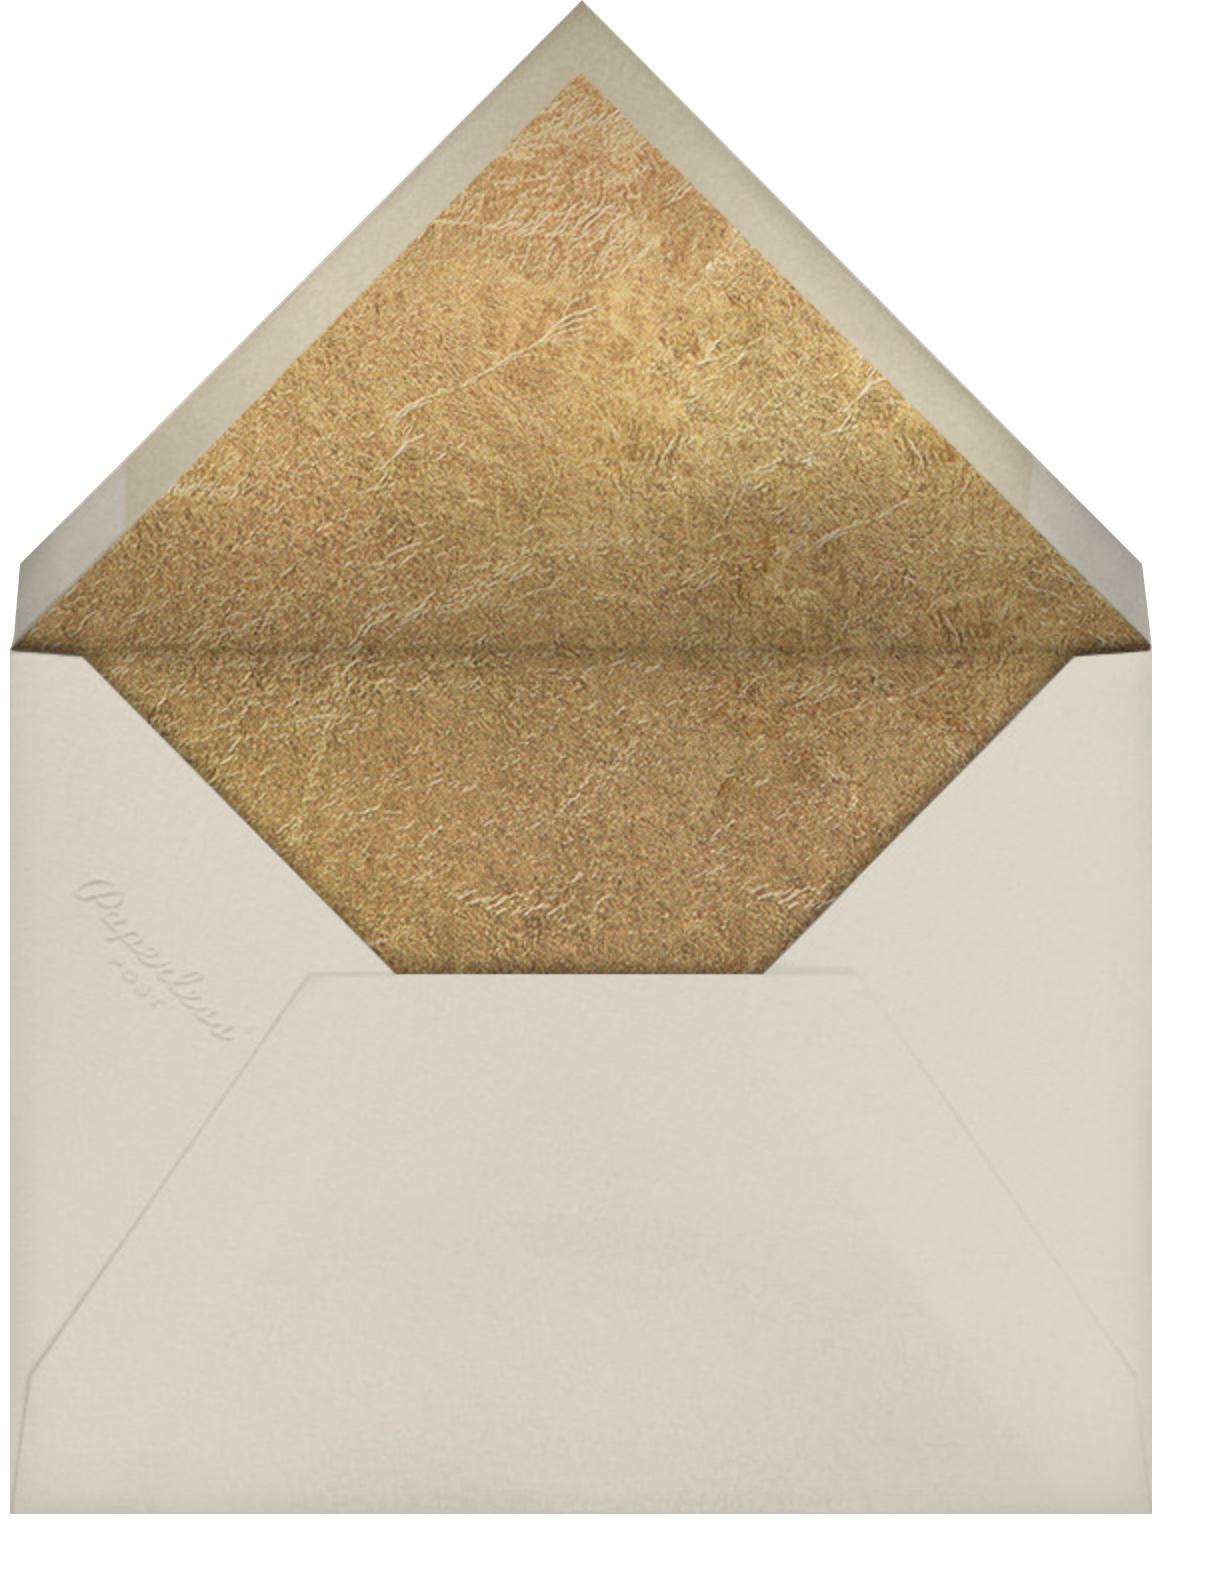 Parallax - Kelly Wearstler - Envelope